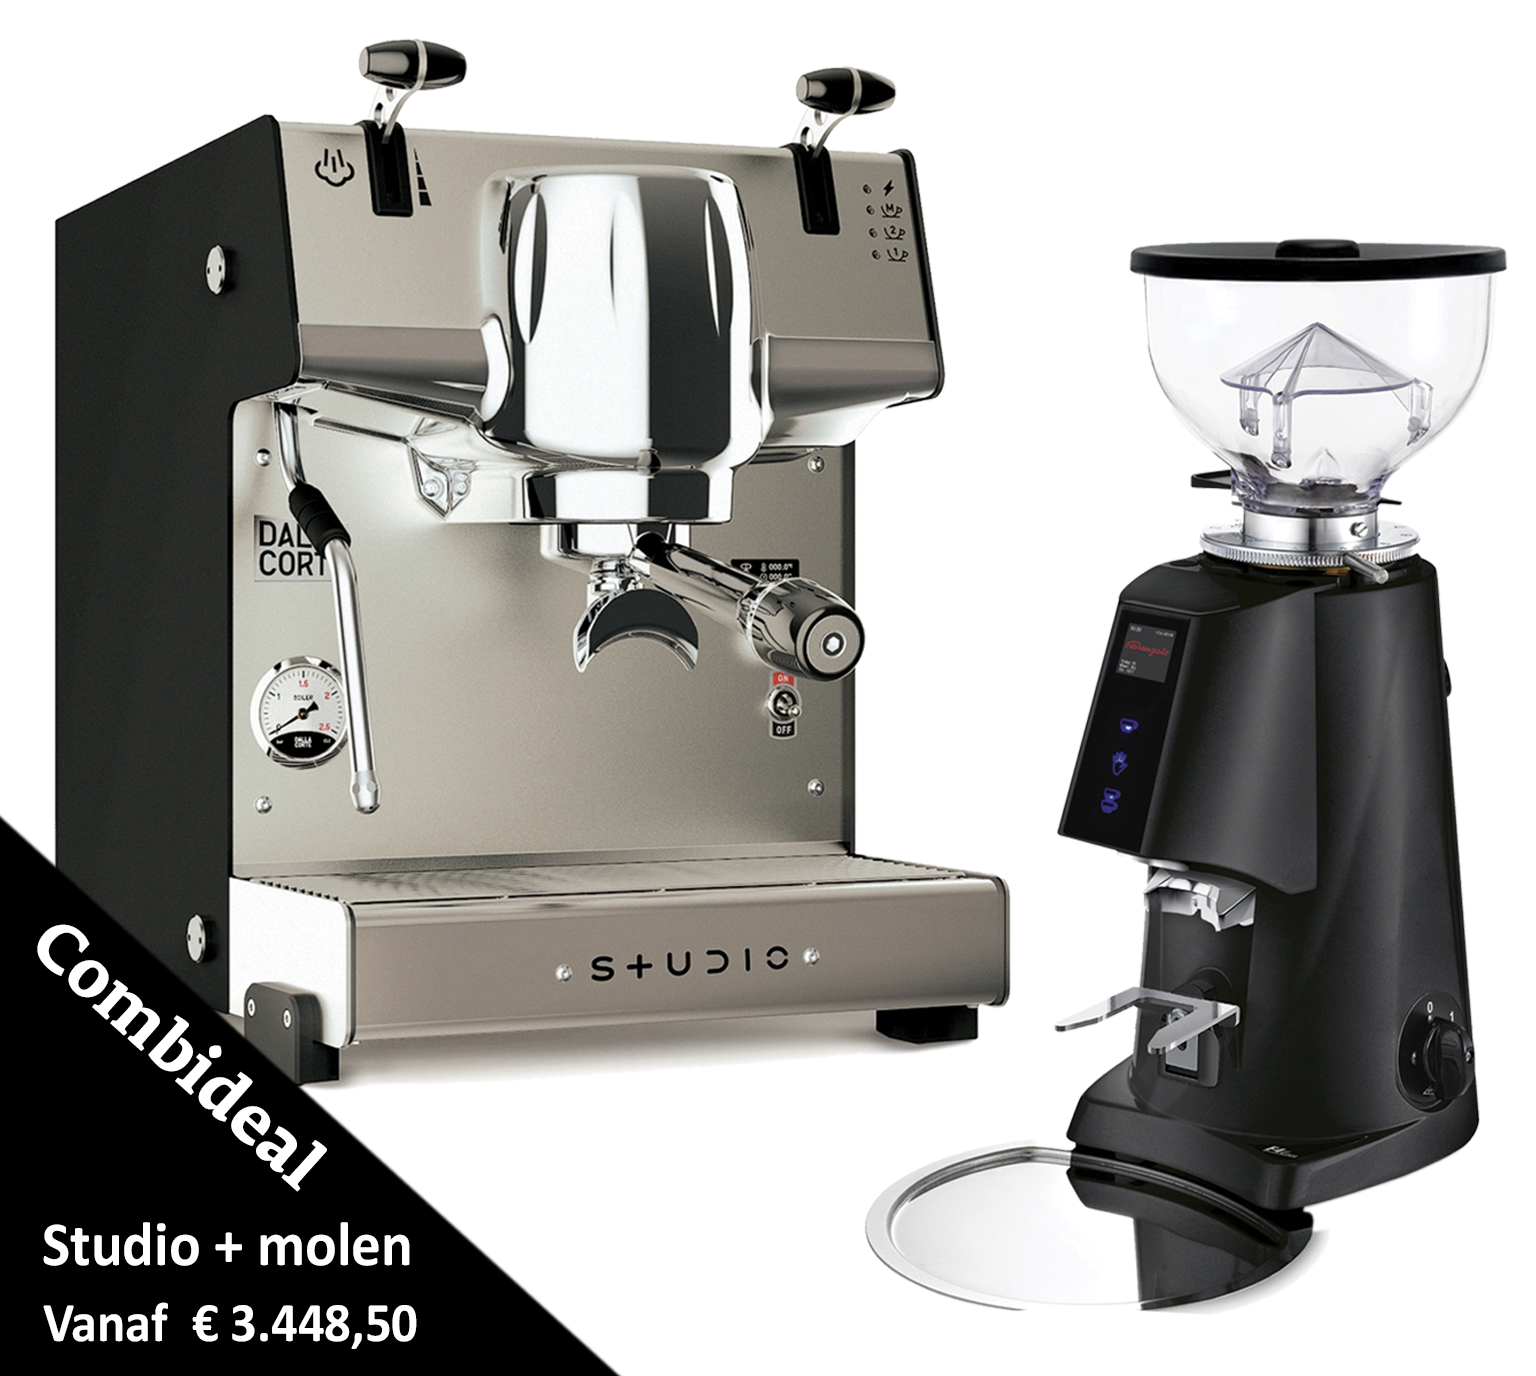 Espressomachine voor thuis